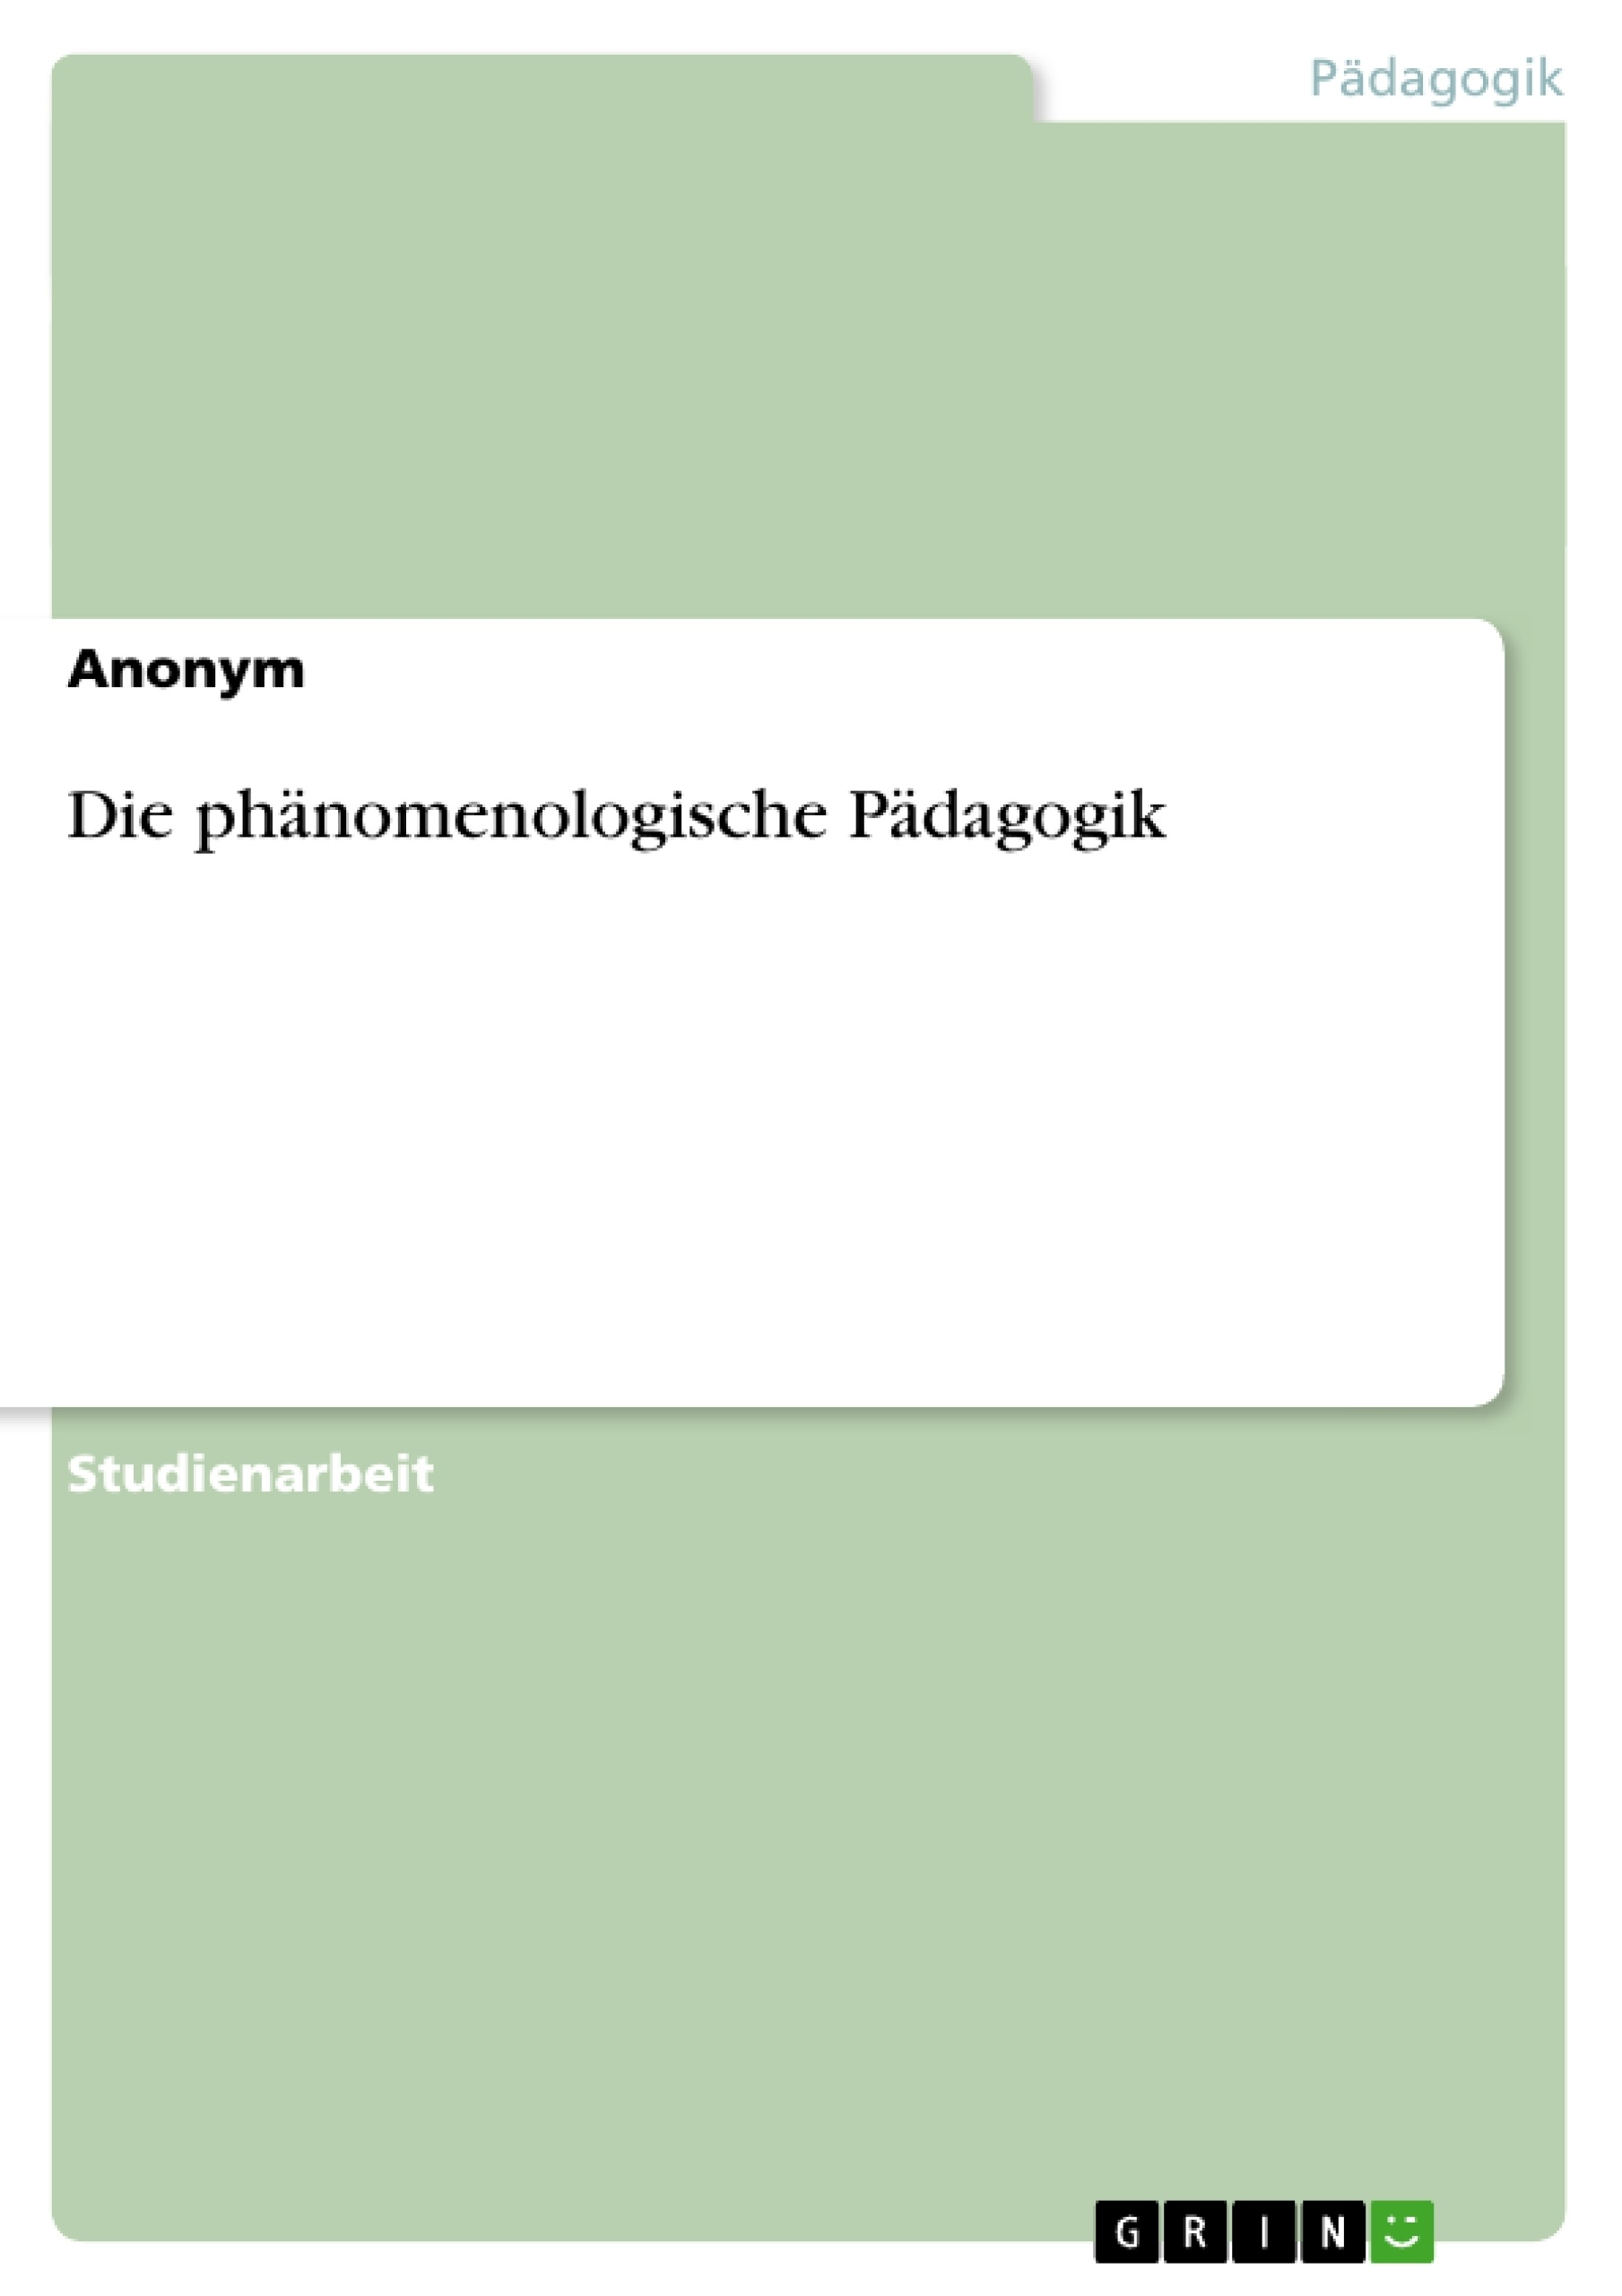 Titel: Die phänomenologische Pädagogik